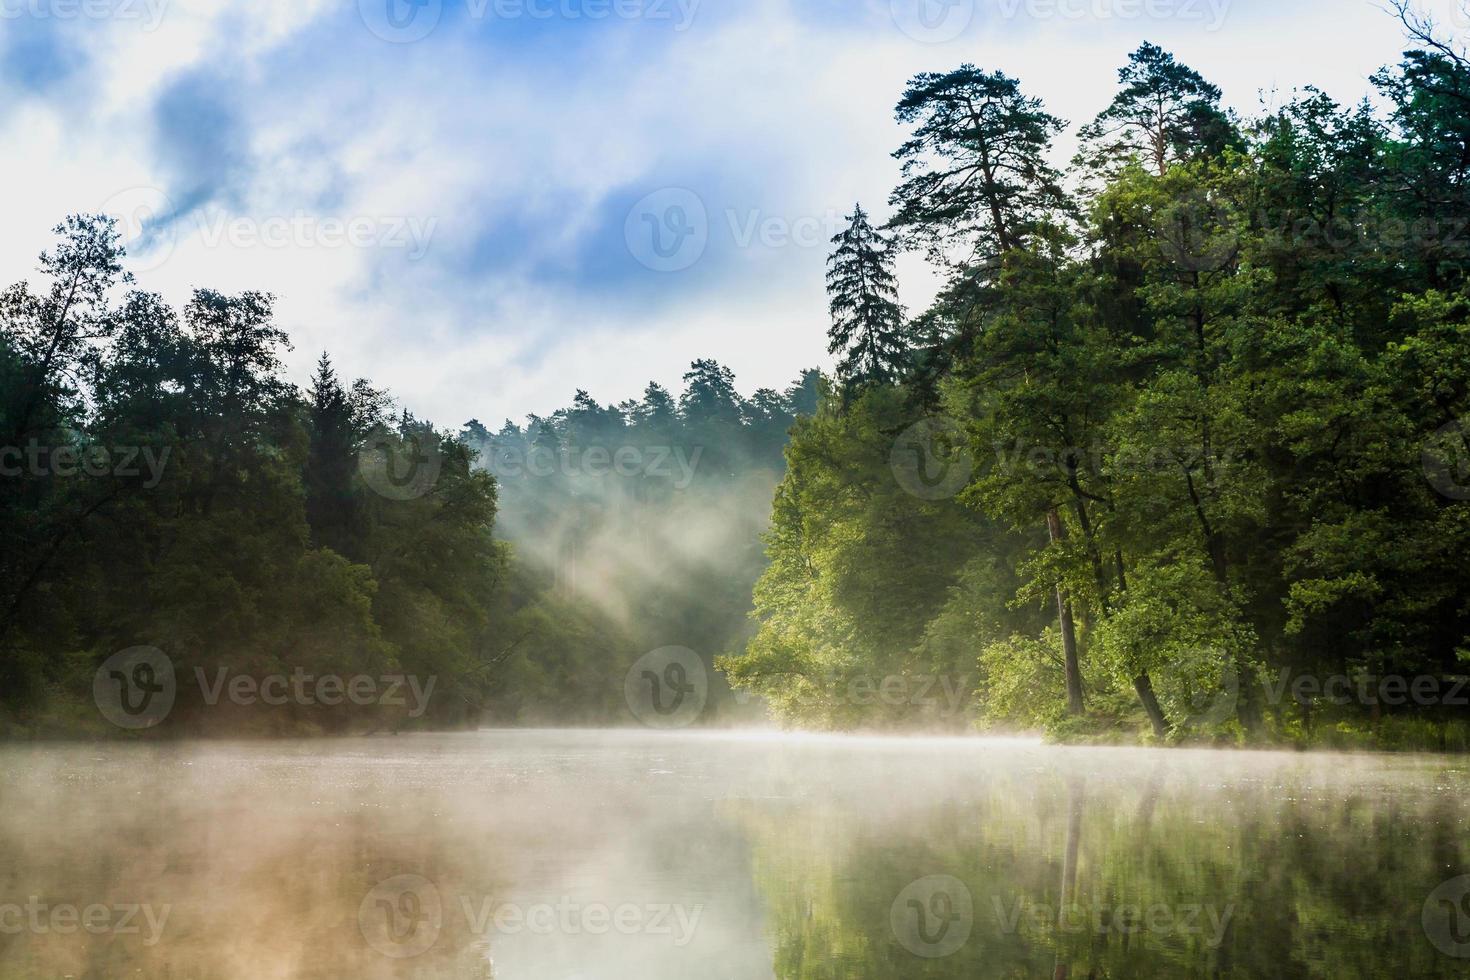 río łyna foto